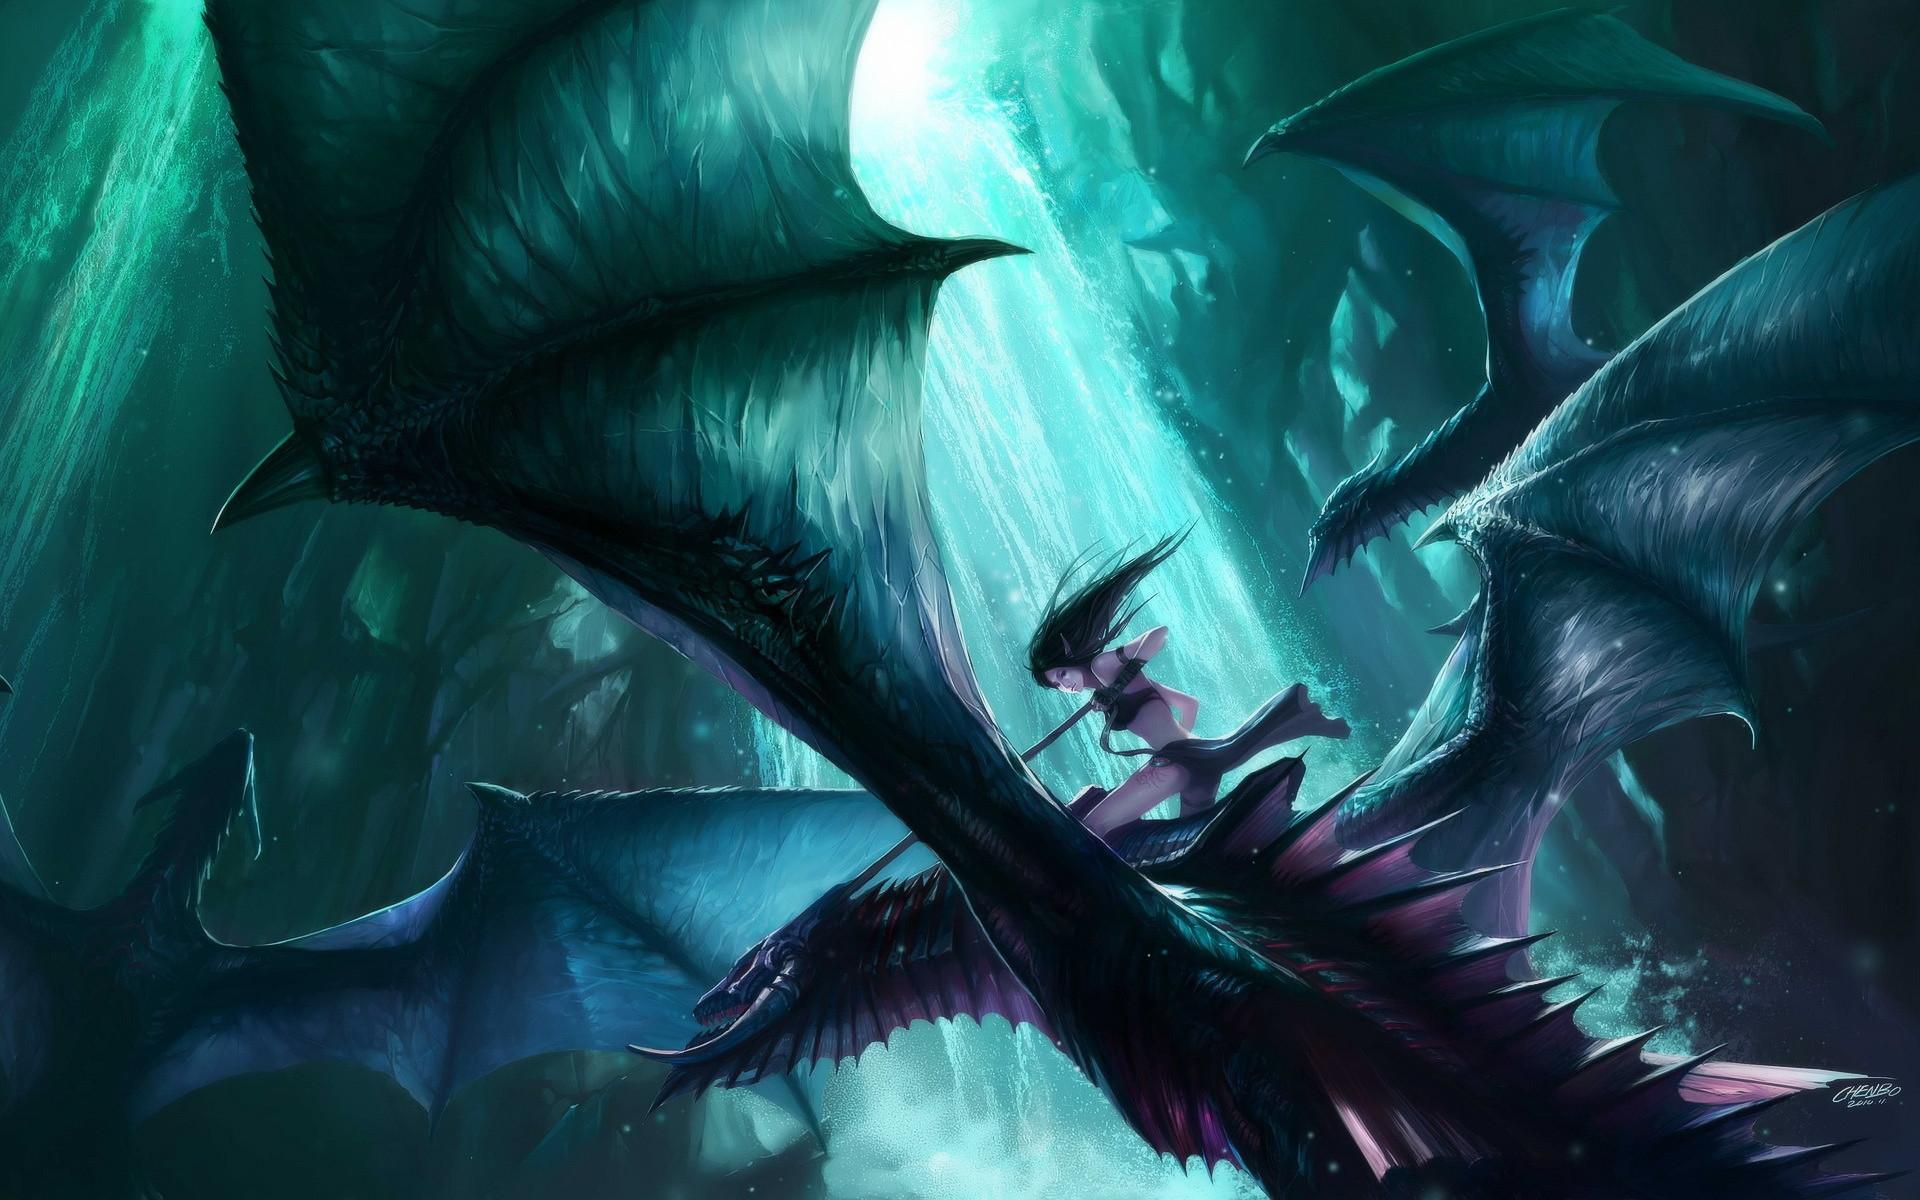 1920x1200 Dungeons And Dragons Wallpaper 1920x1080 Wallpapersafari Articles Online 686037 Walldevil